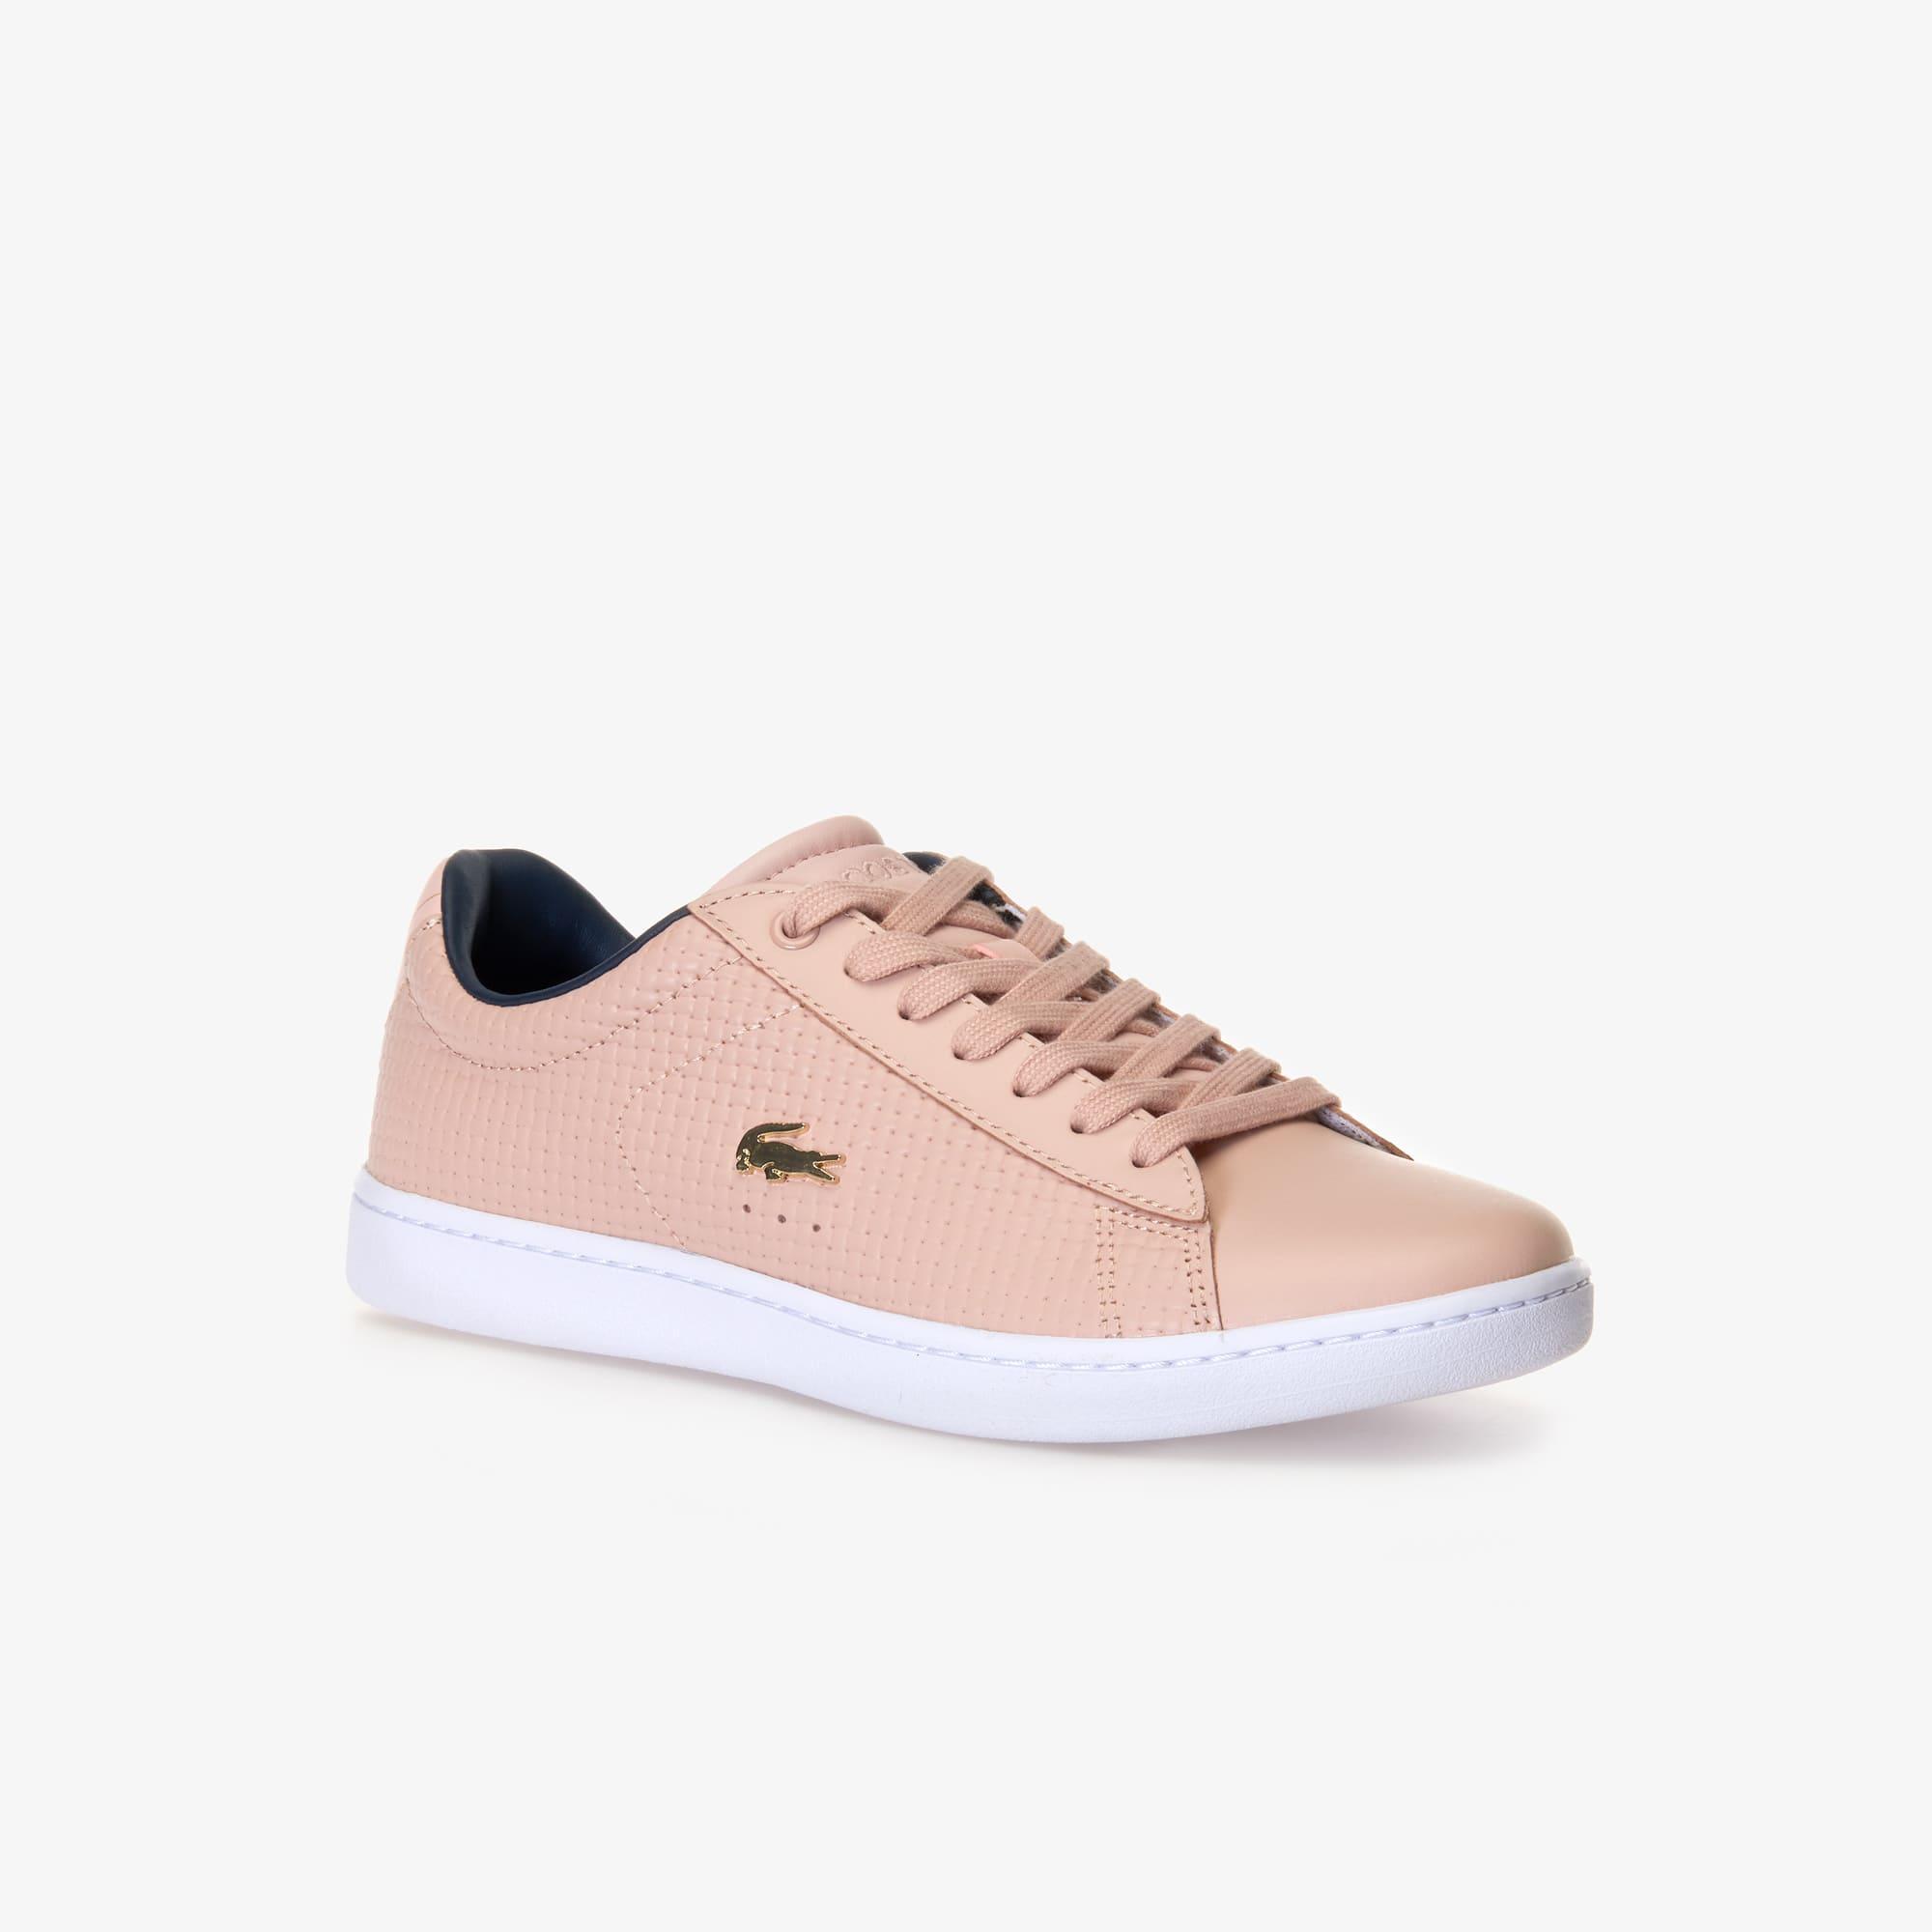 Damen-Sneakers CARNABY EVO aus gewebtem Leder